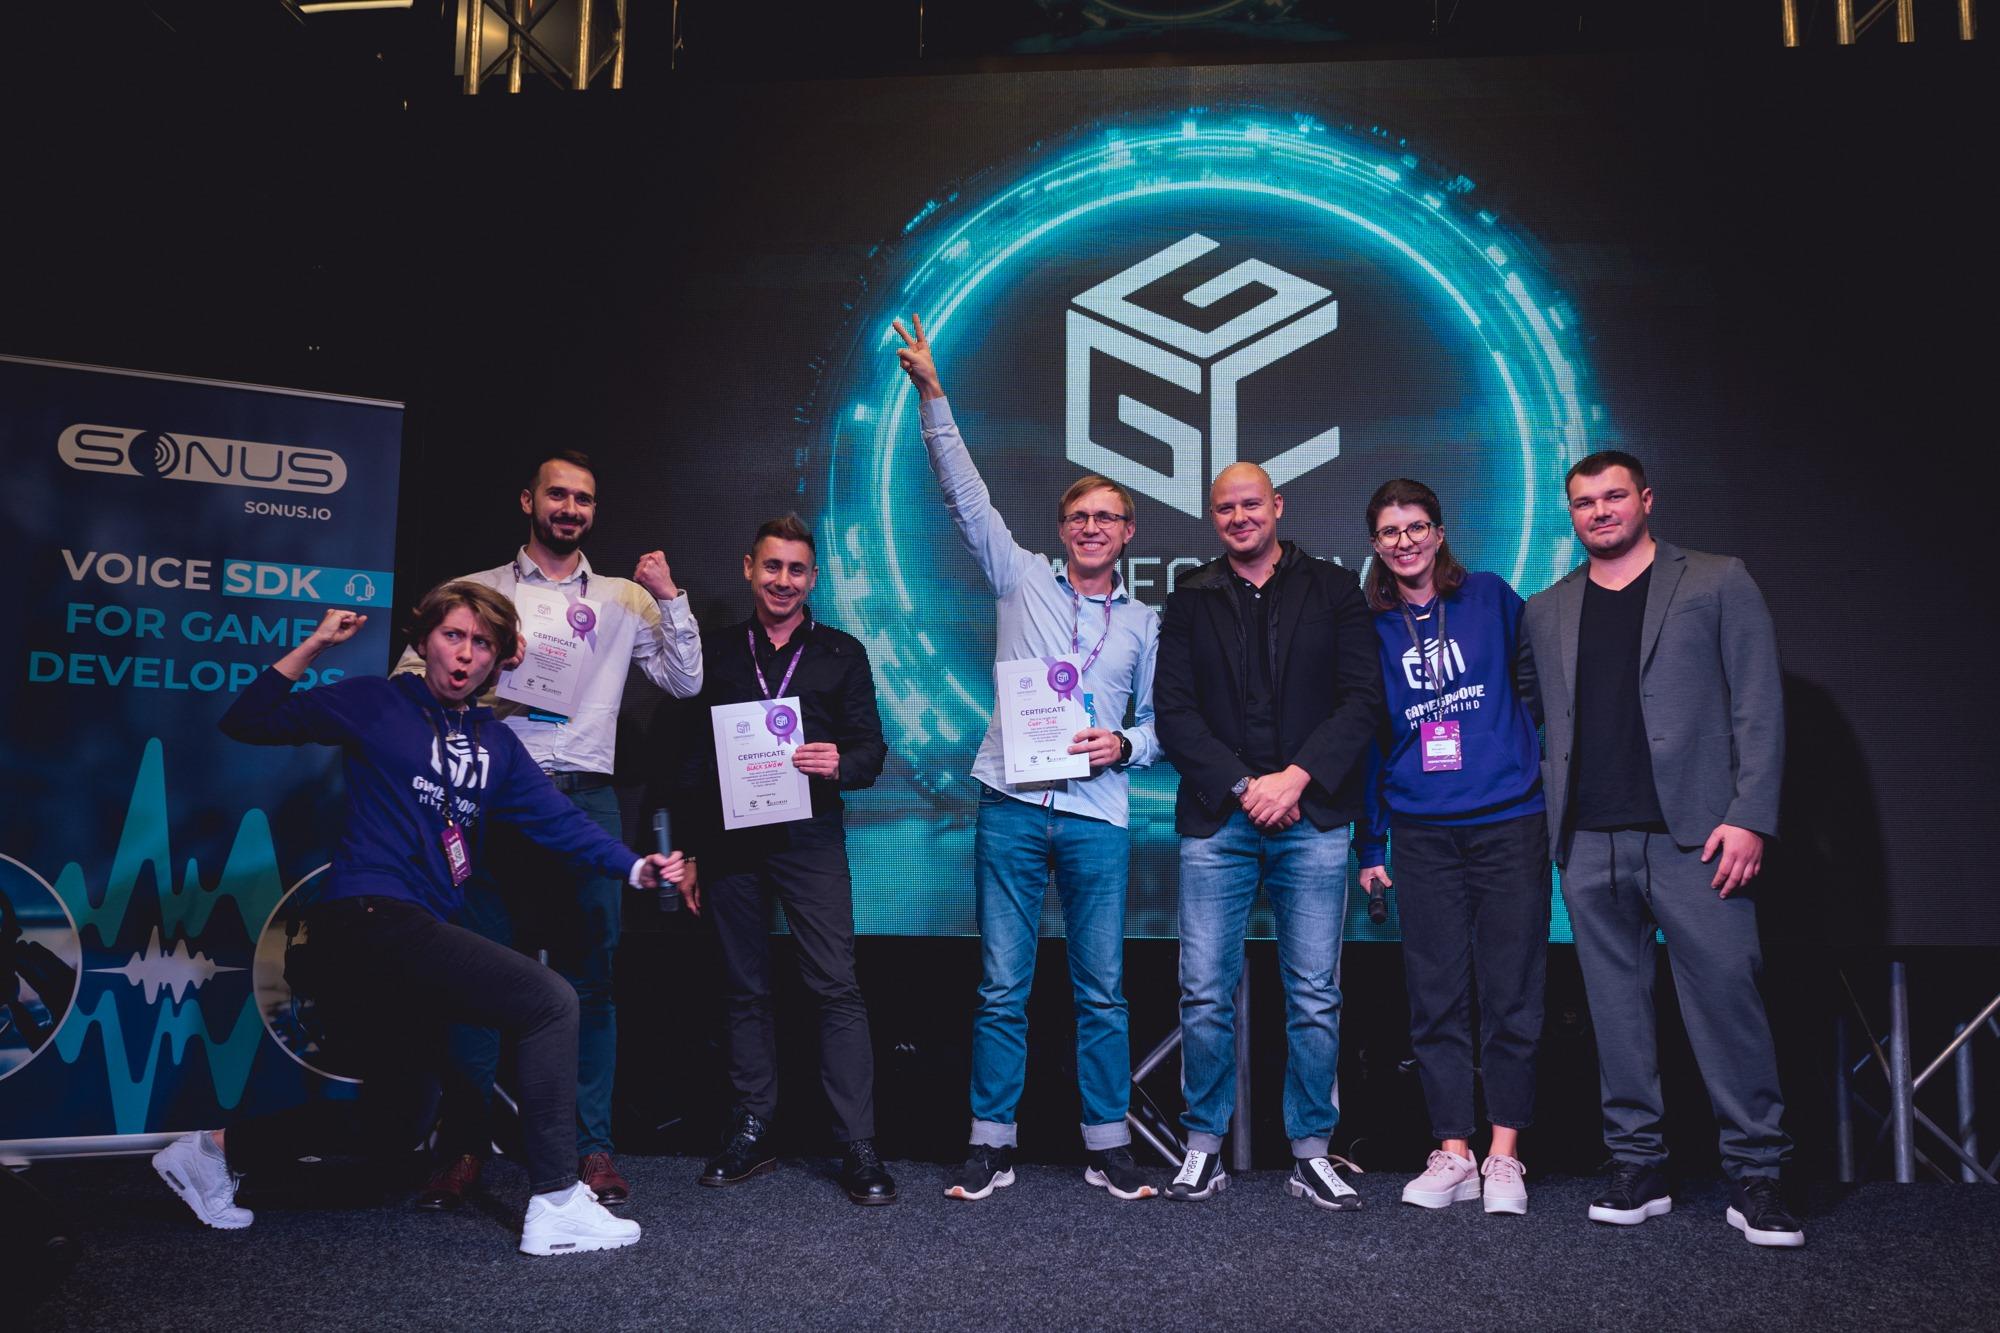 Caer Sidi at GameGroove Mastermind 2019